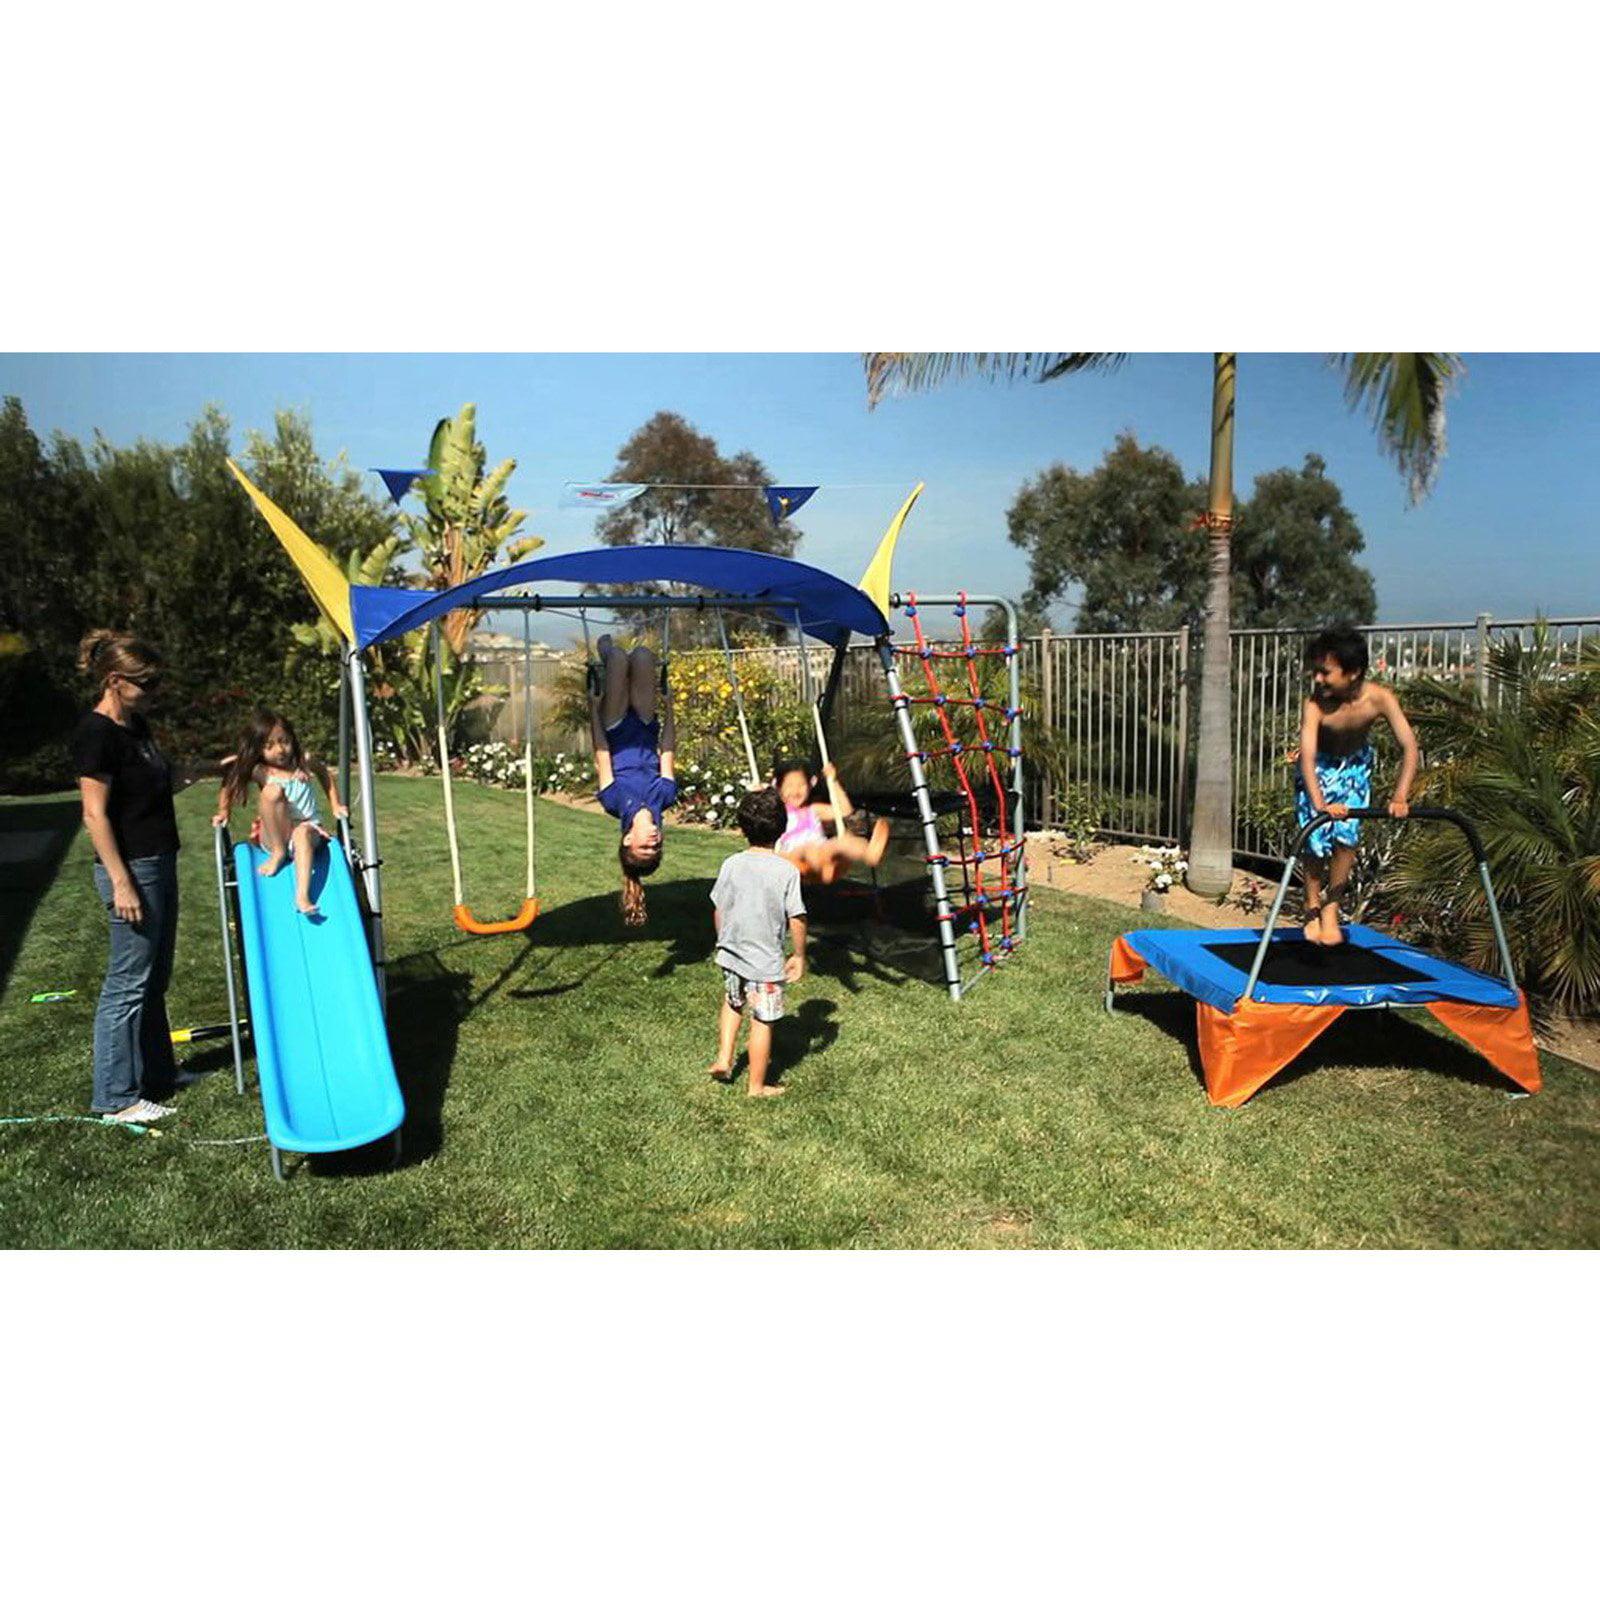 IronKids Premier 550 Fitness Playground